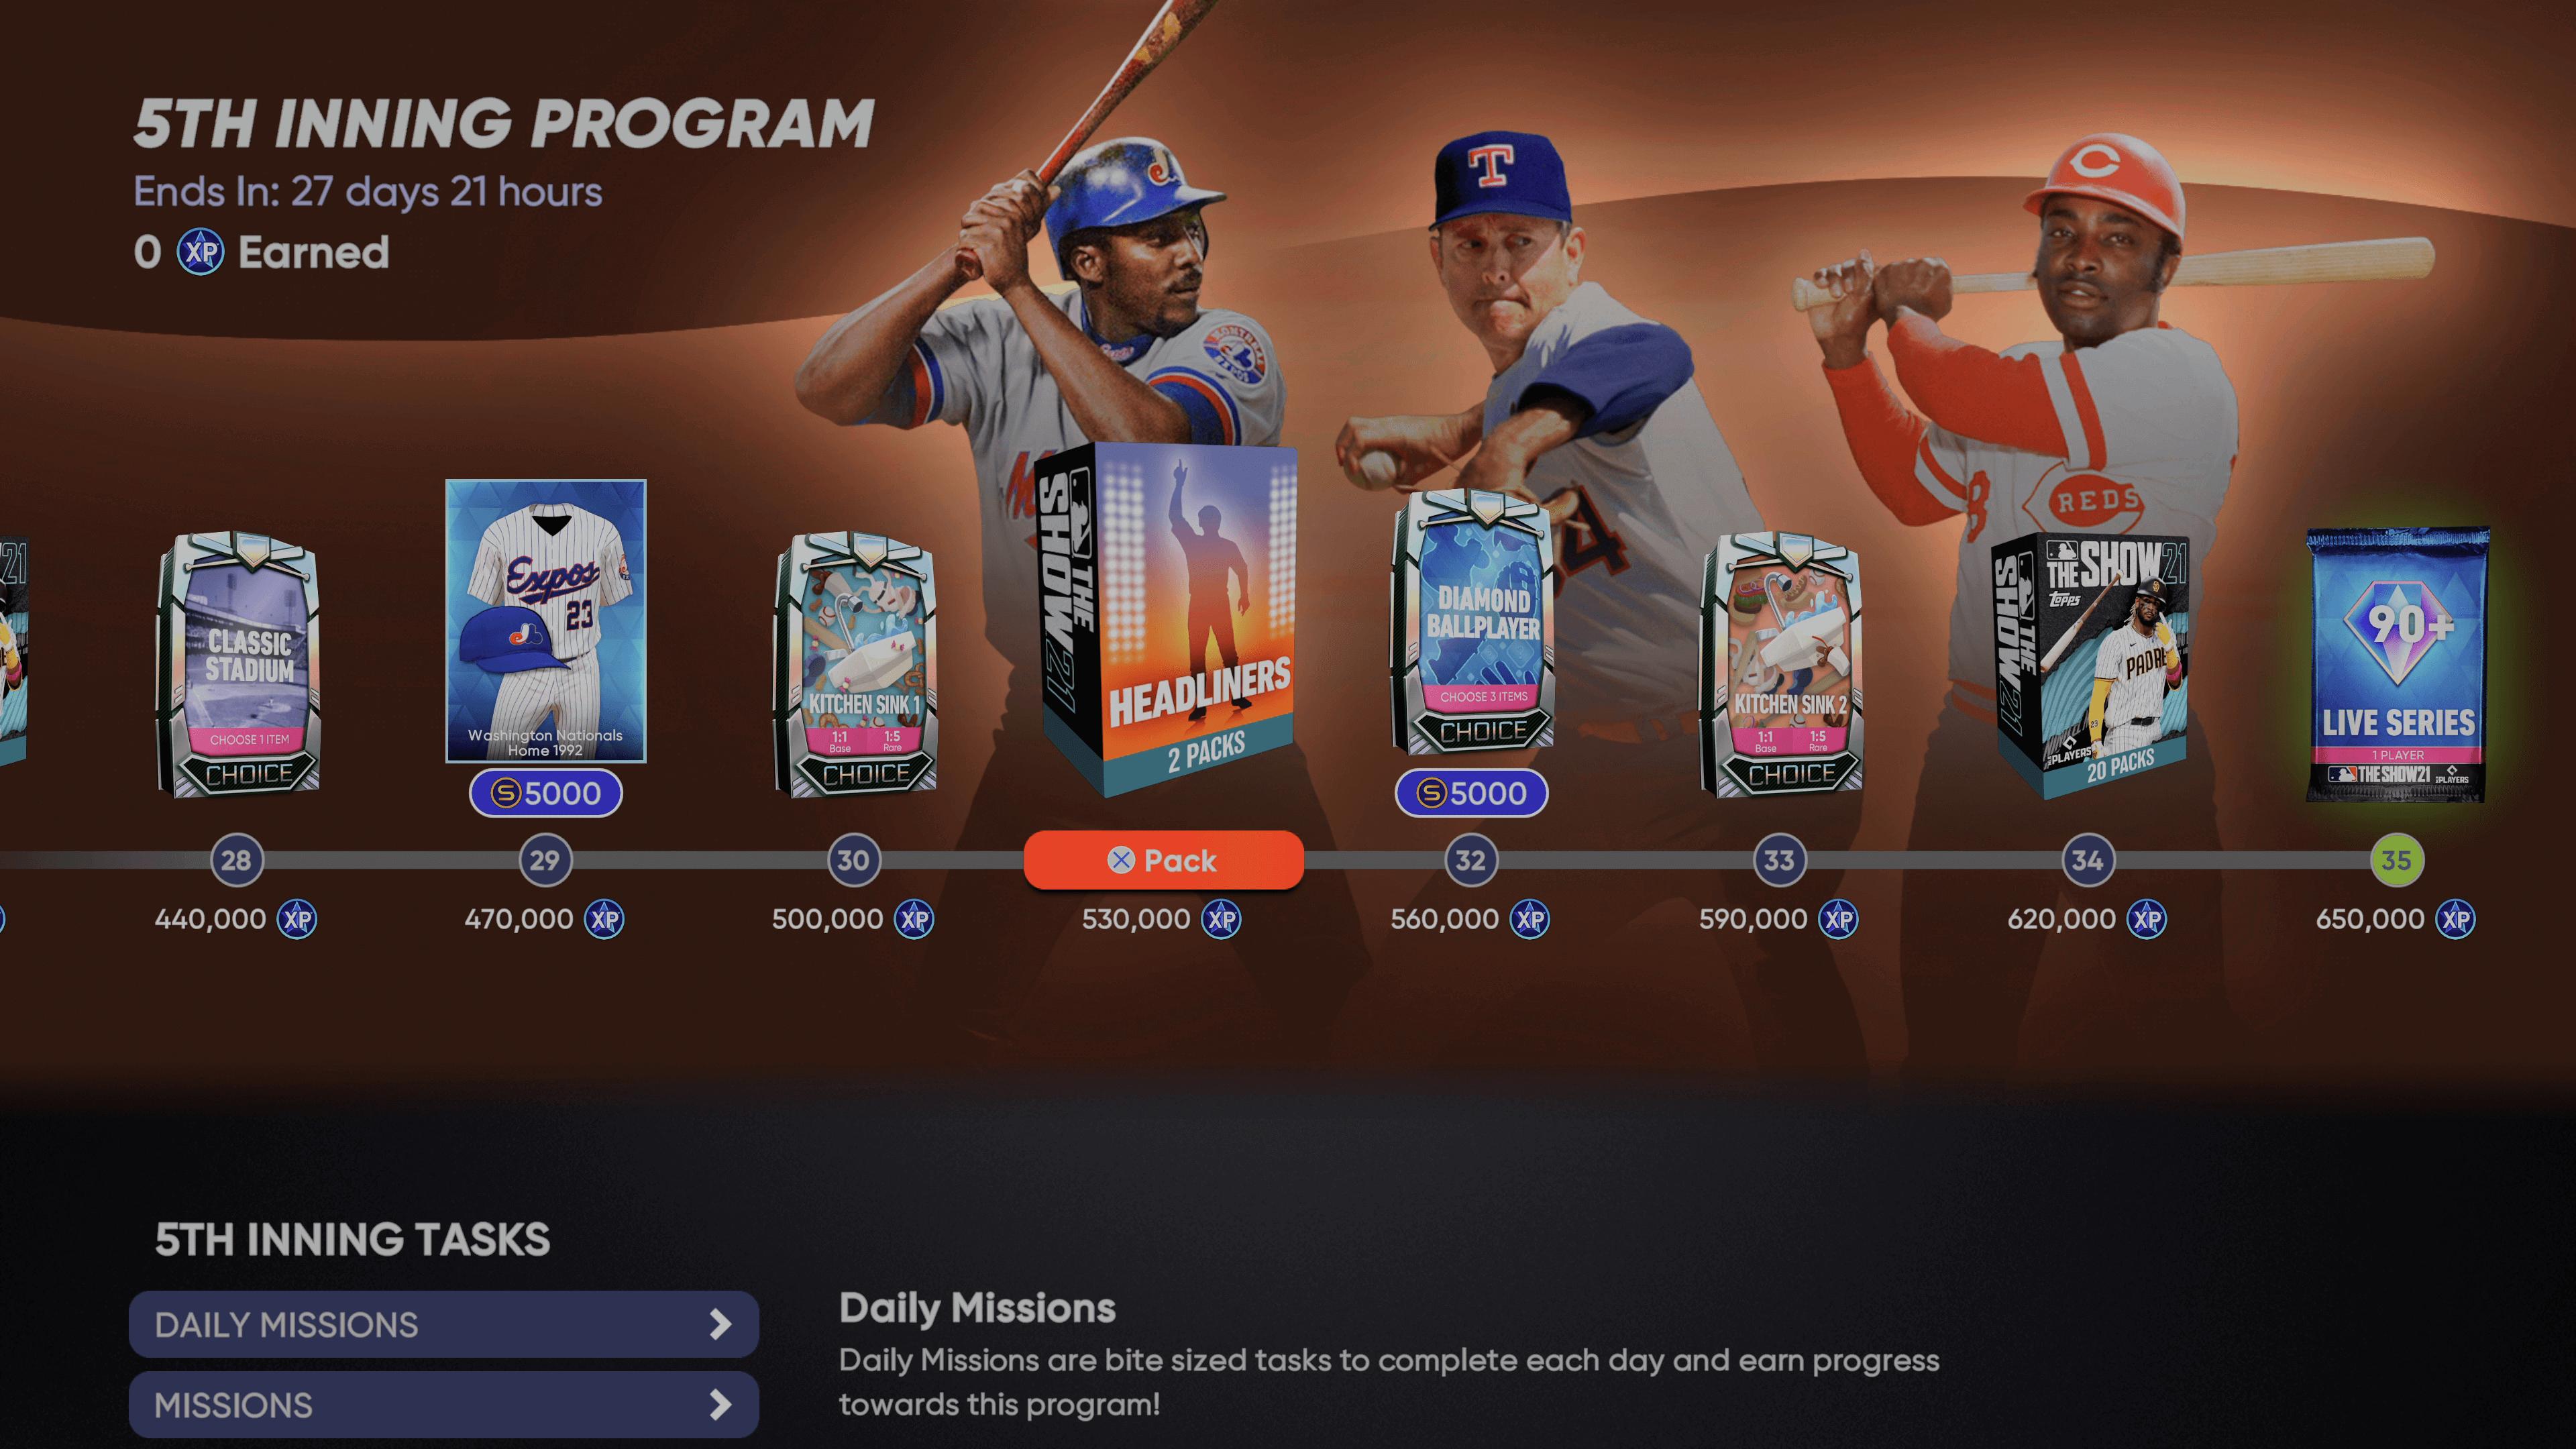 MLB The Show 21 5th Inning Program Guide